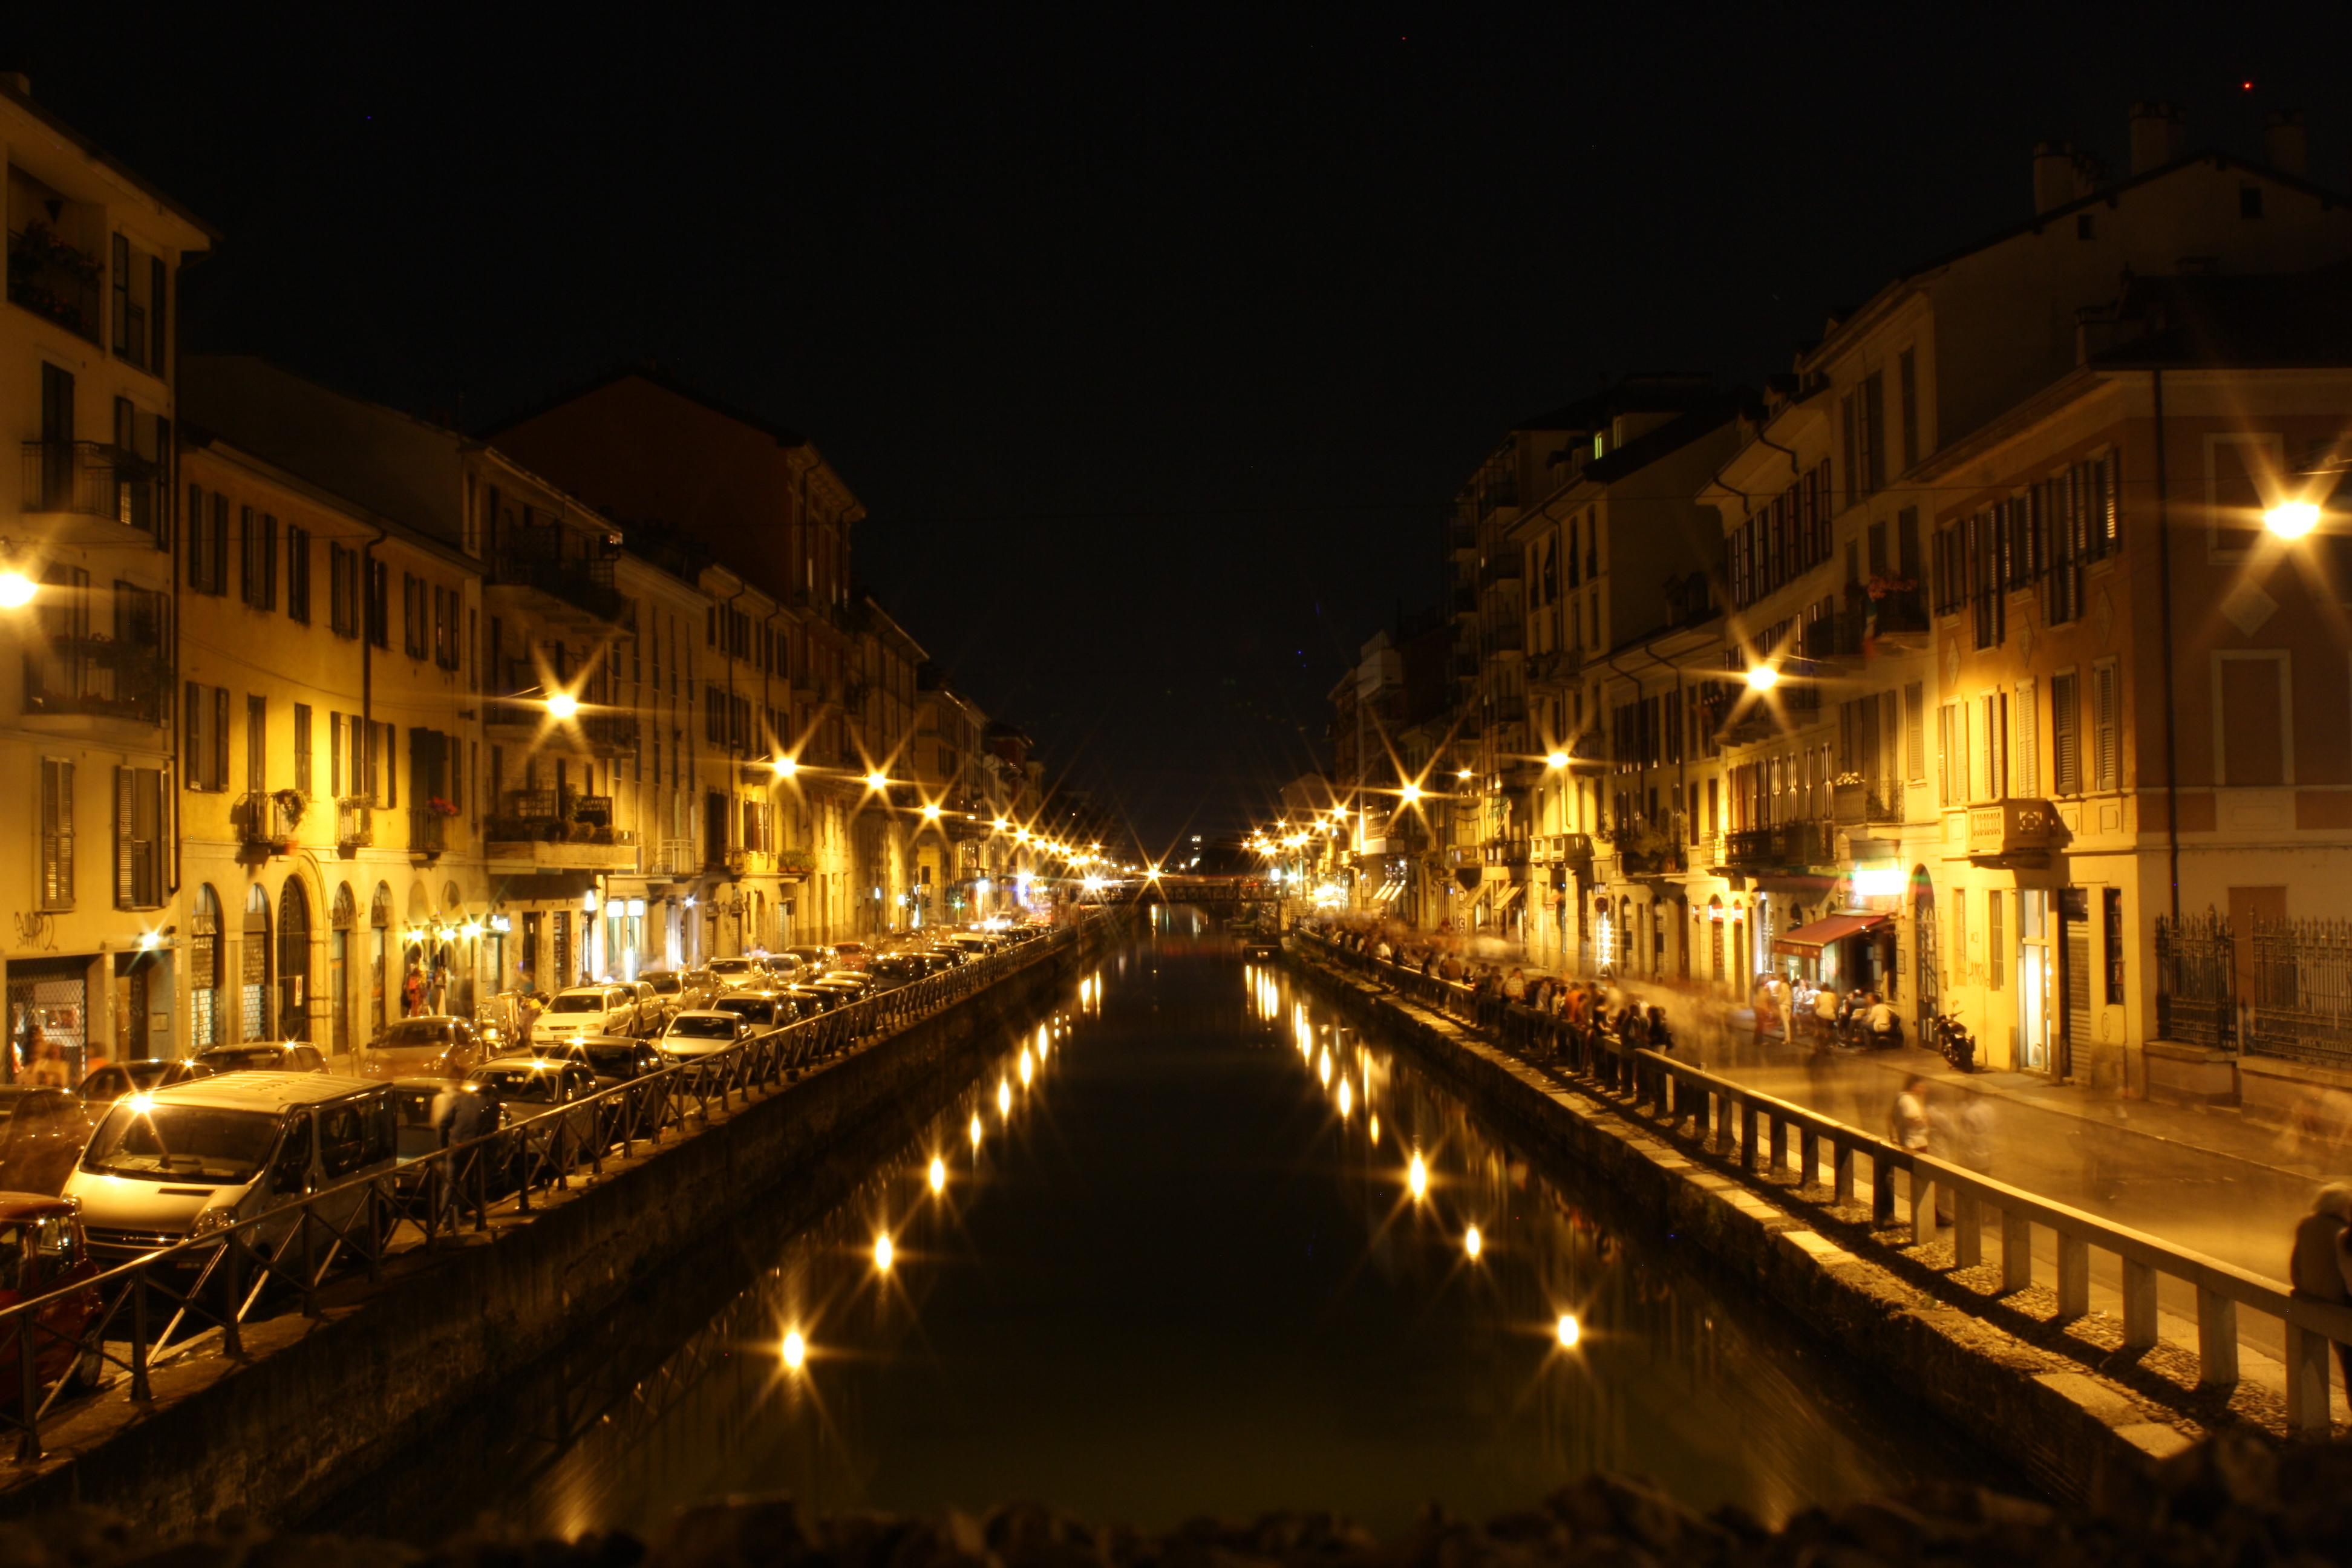 milano at night by xxxmaxamxxx on deviantart